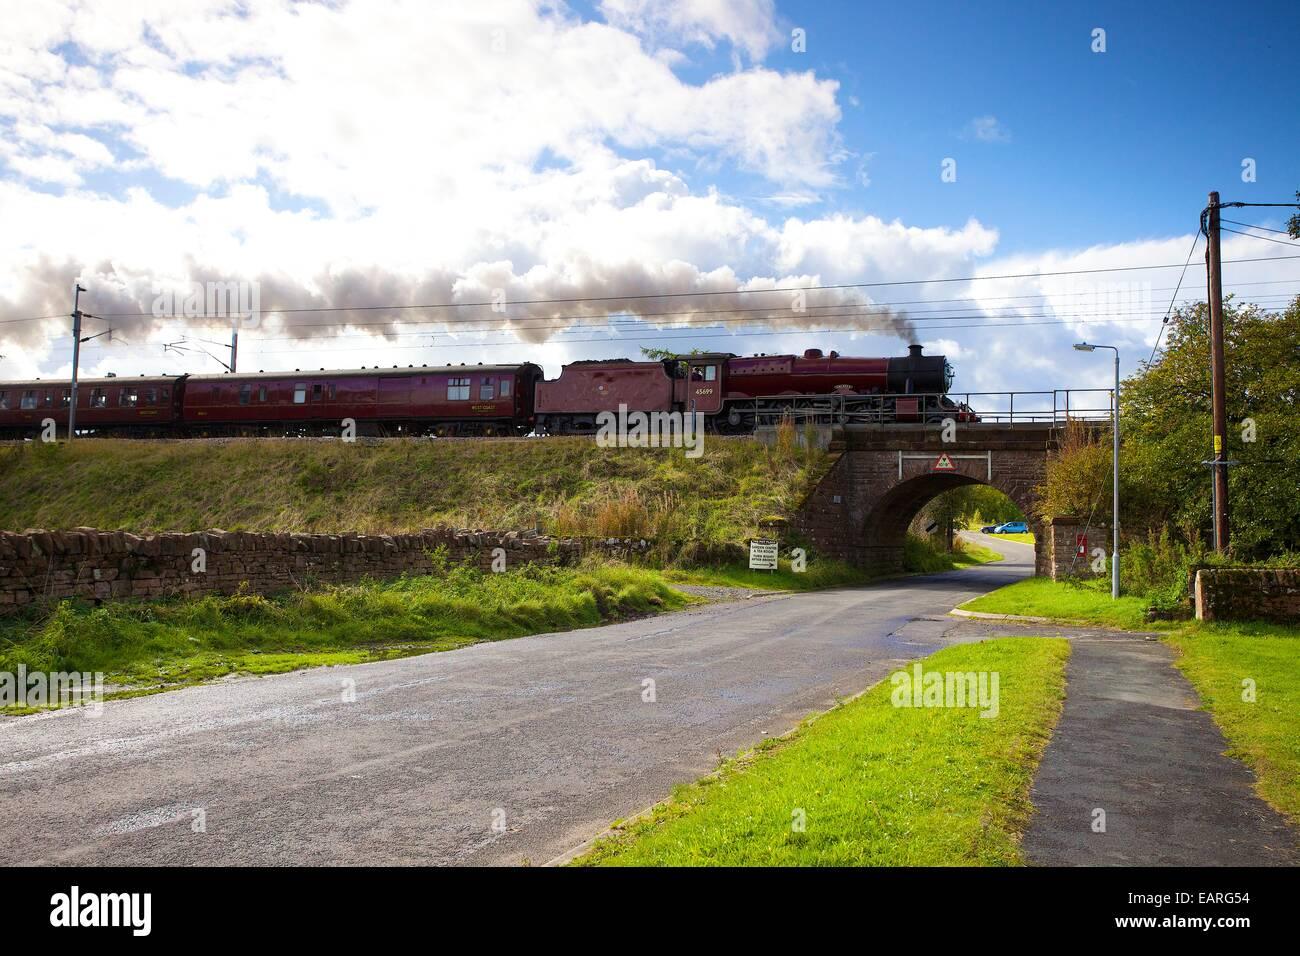 Steam locomotive LMS Jubilee Class 45699 Galatea at Plumpton, Cumbria, England, UK. Stock Photo